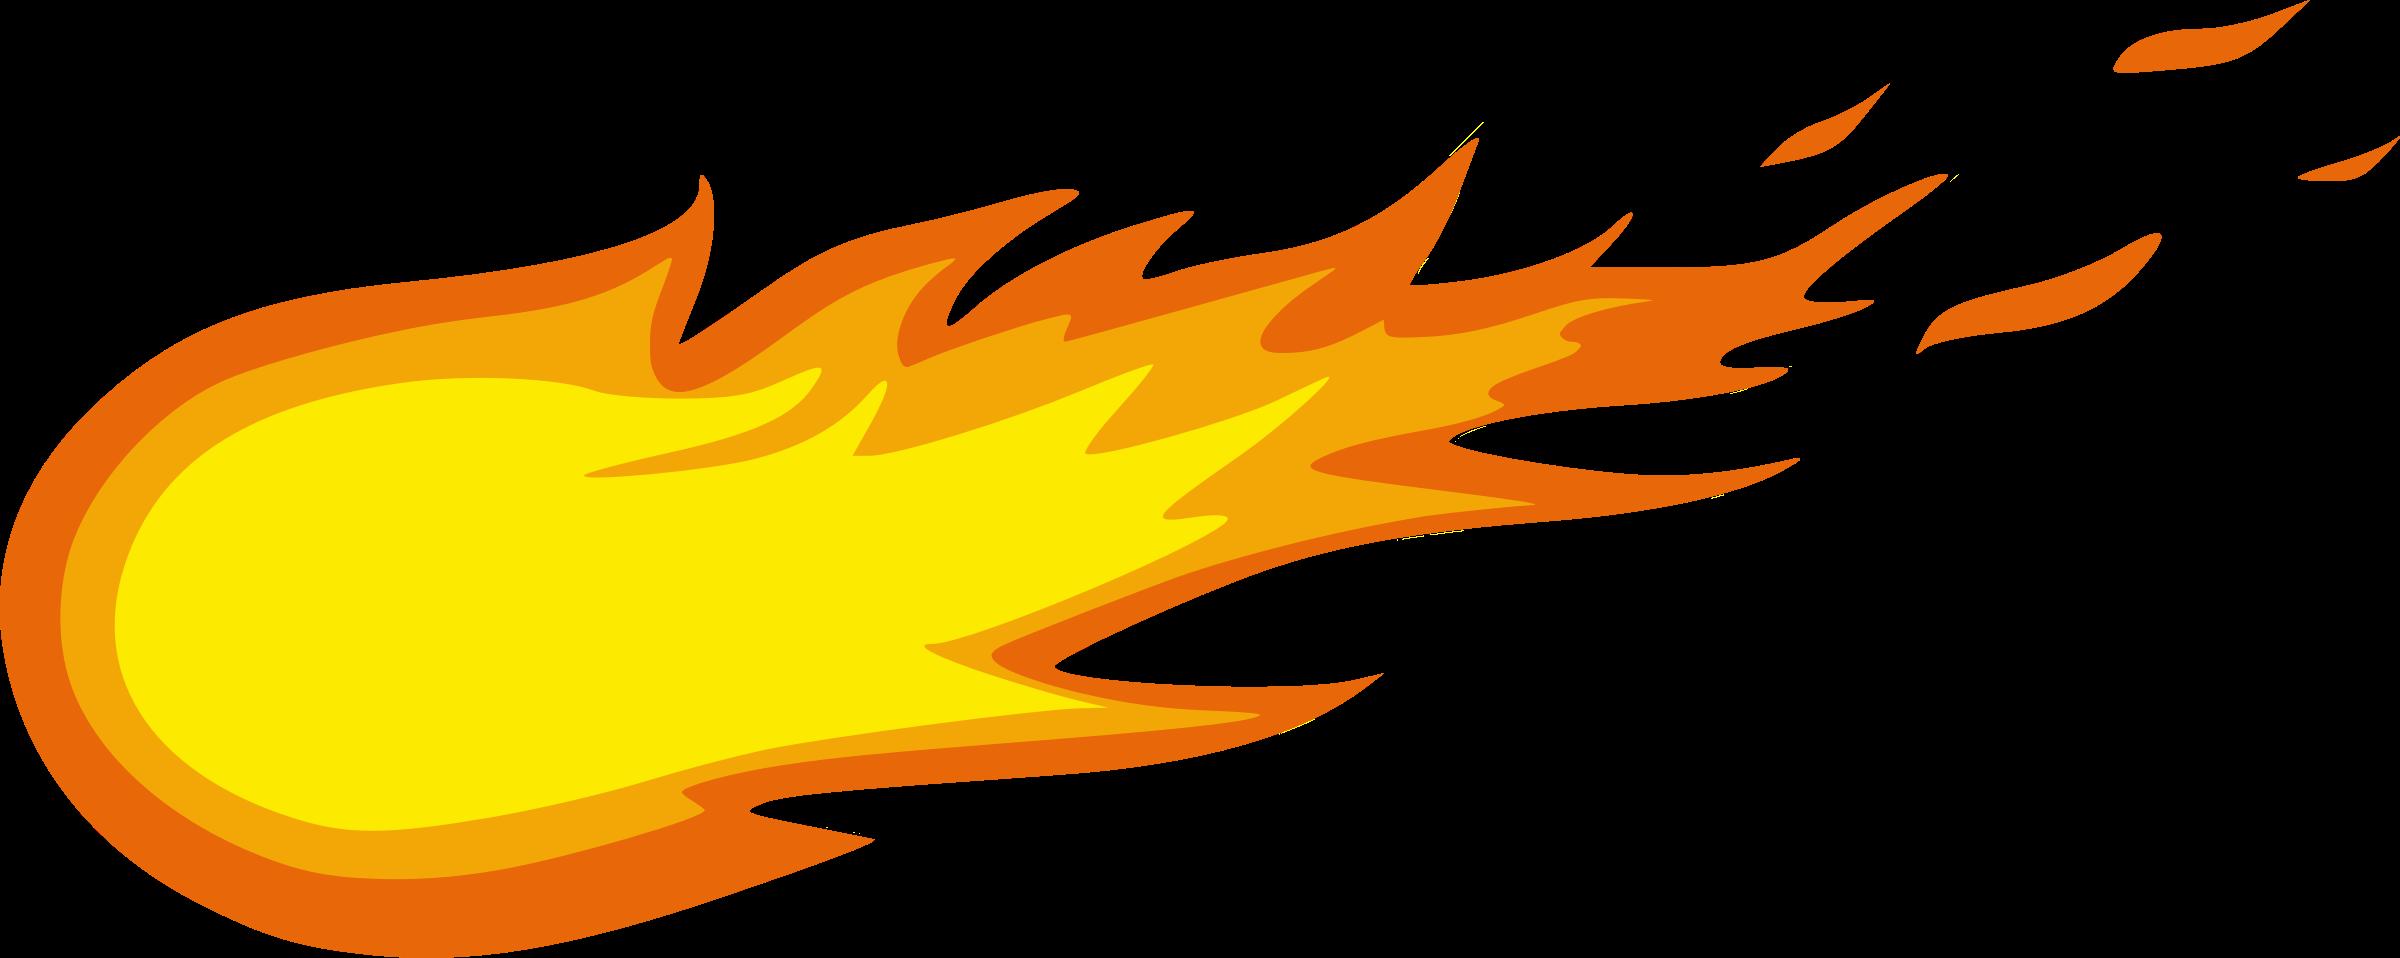 bookmark flame Google Search Картинки